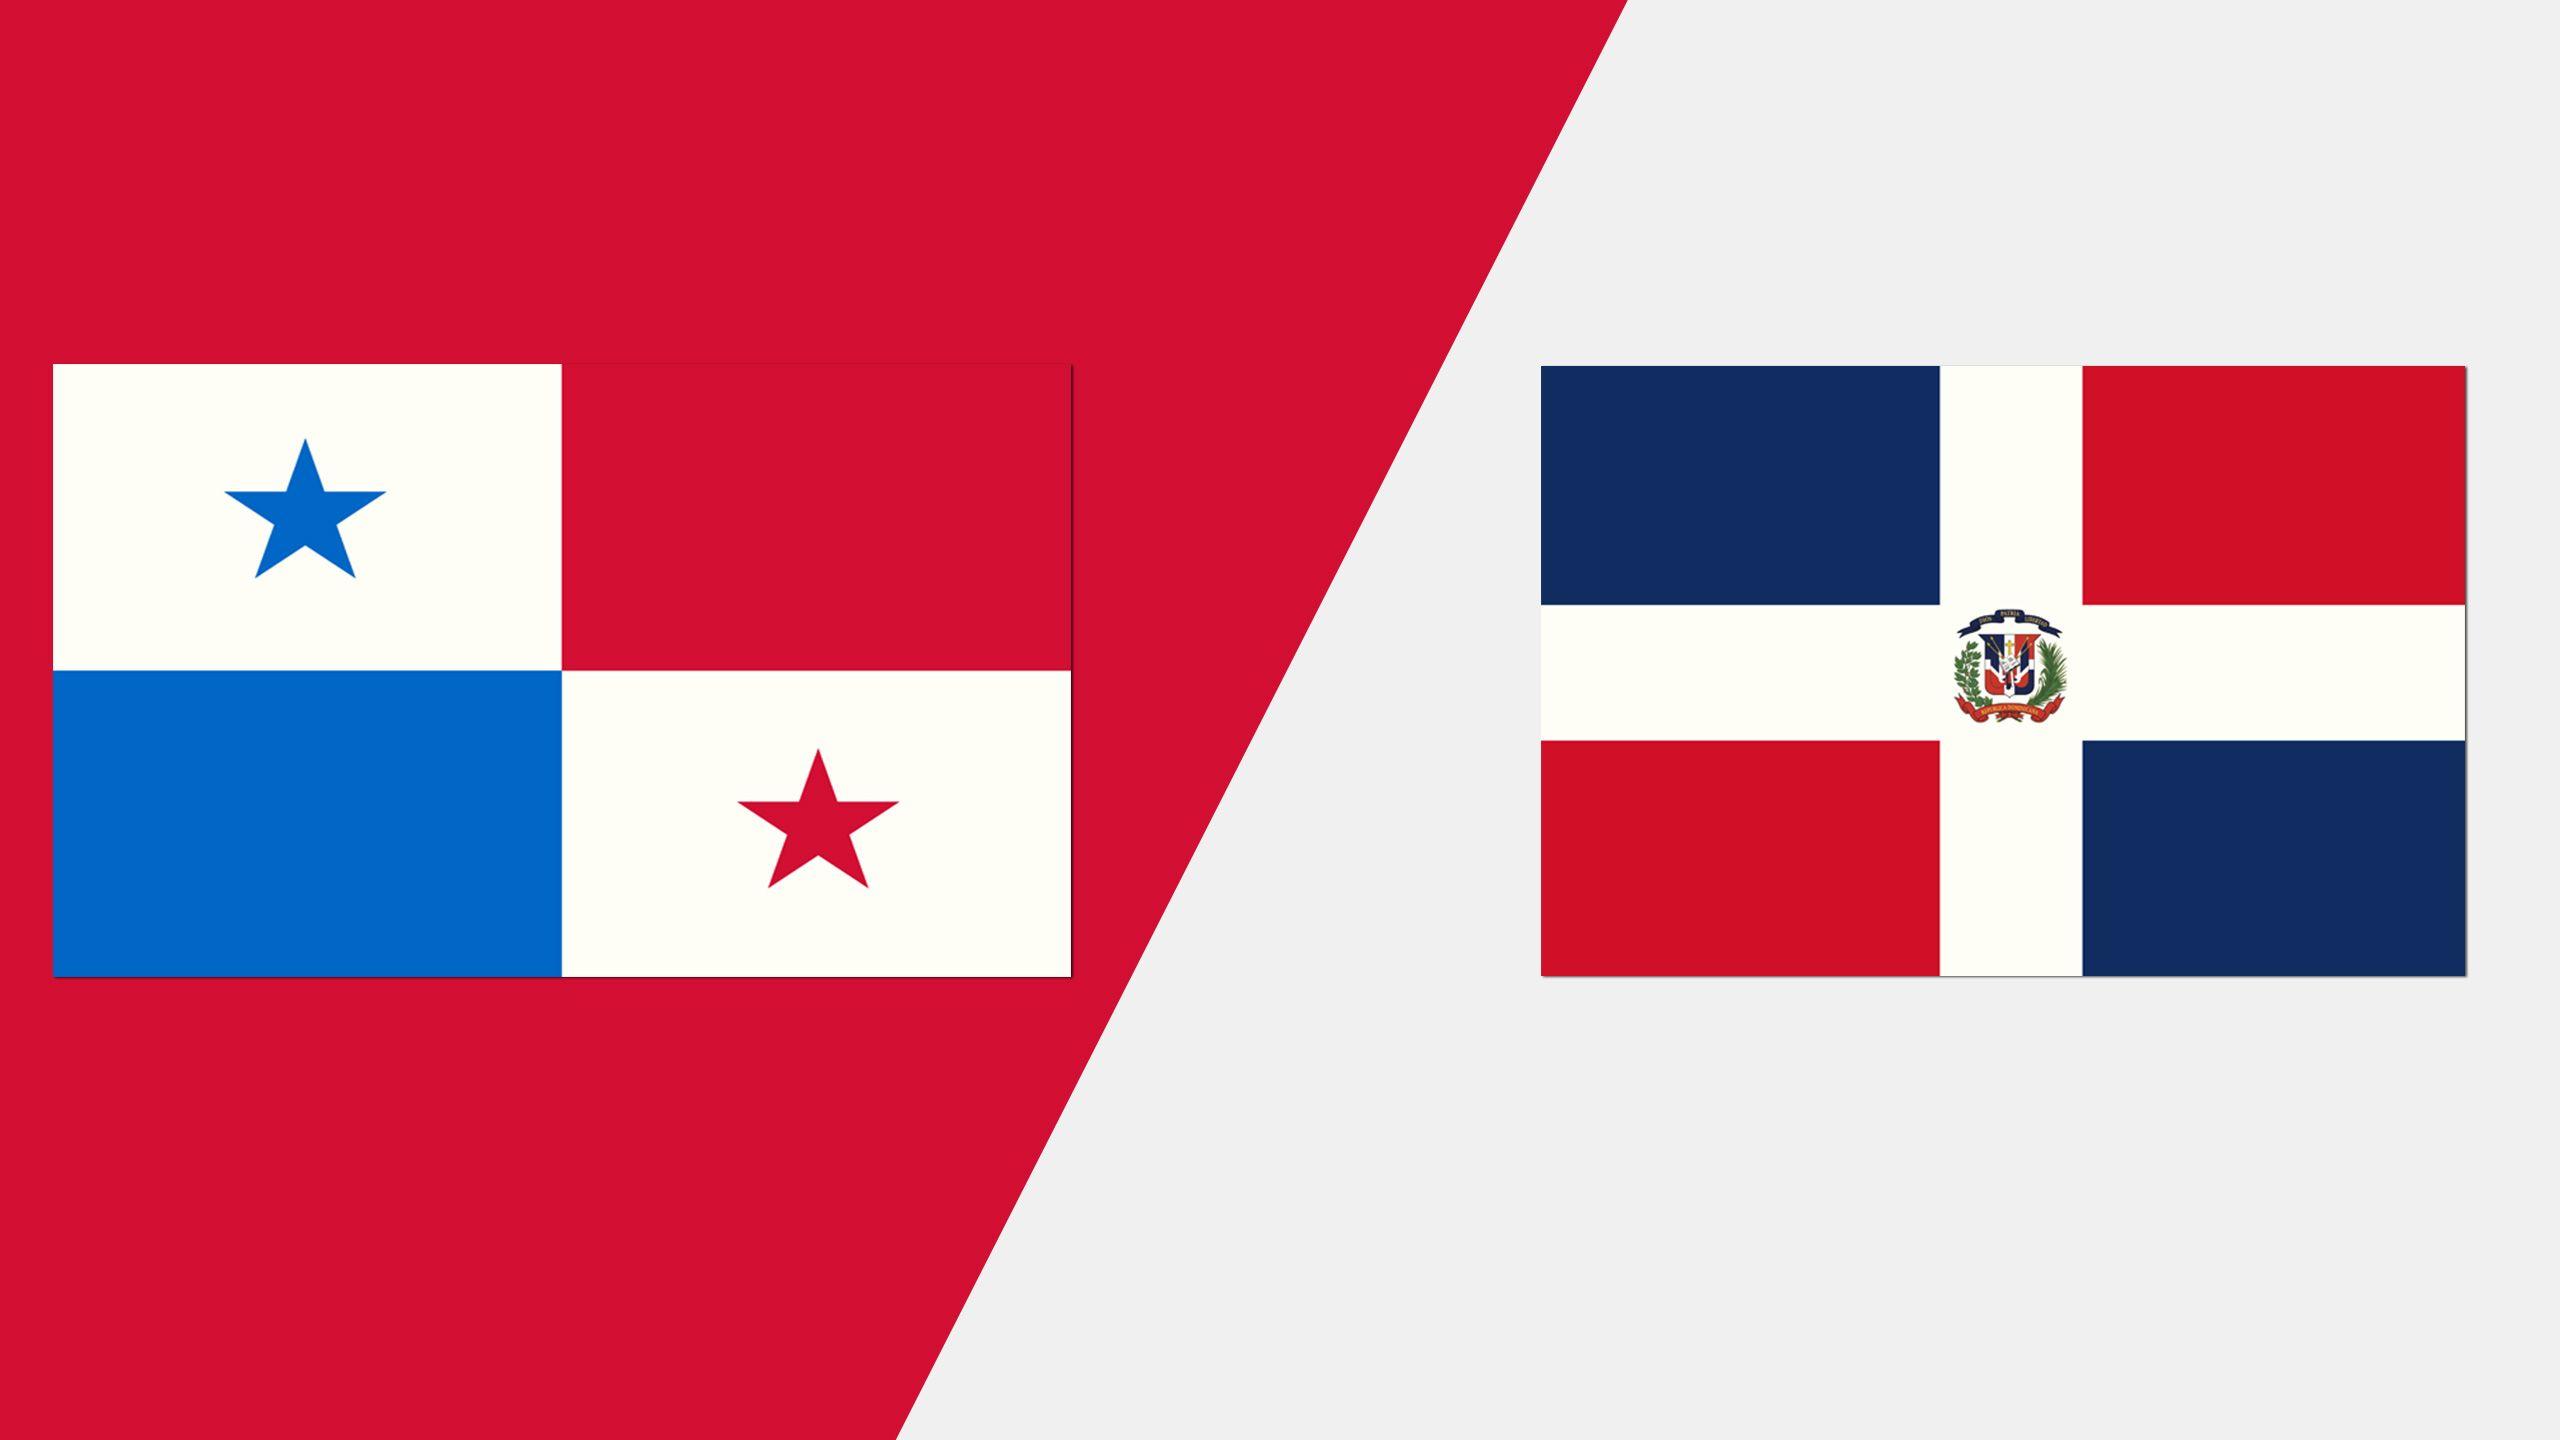 In Spanish - Panama vs. República Dominicana (Grupo A)